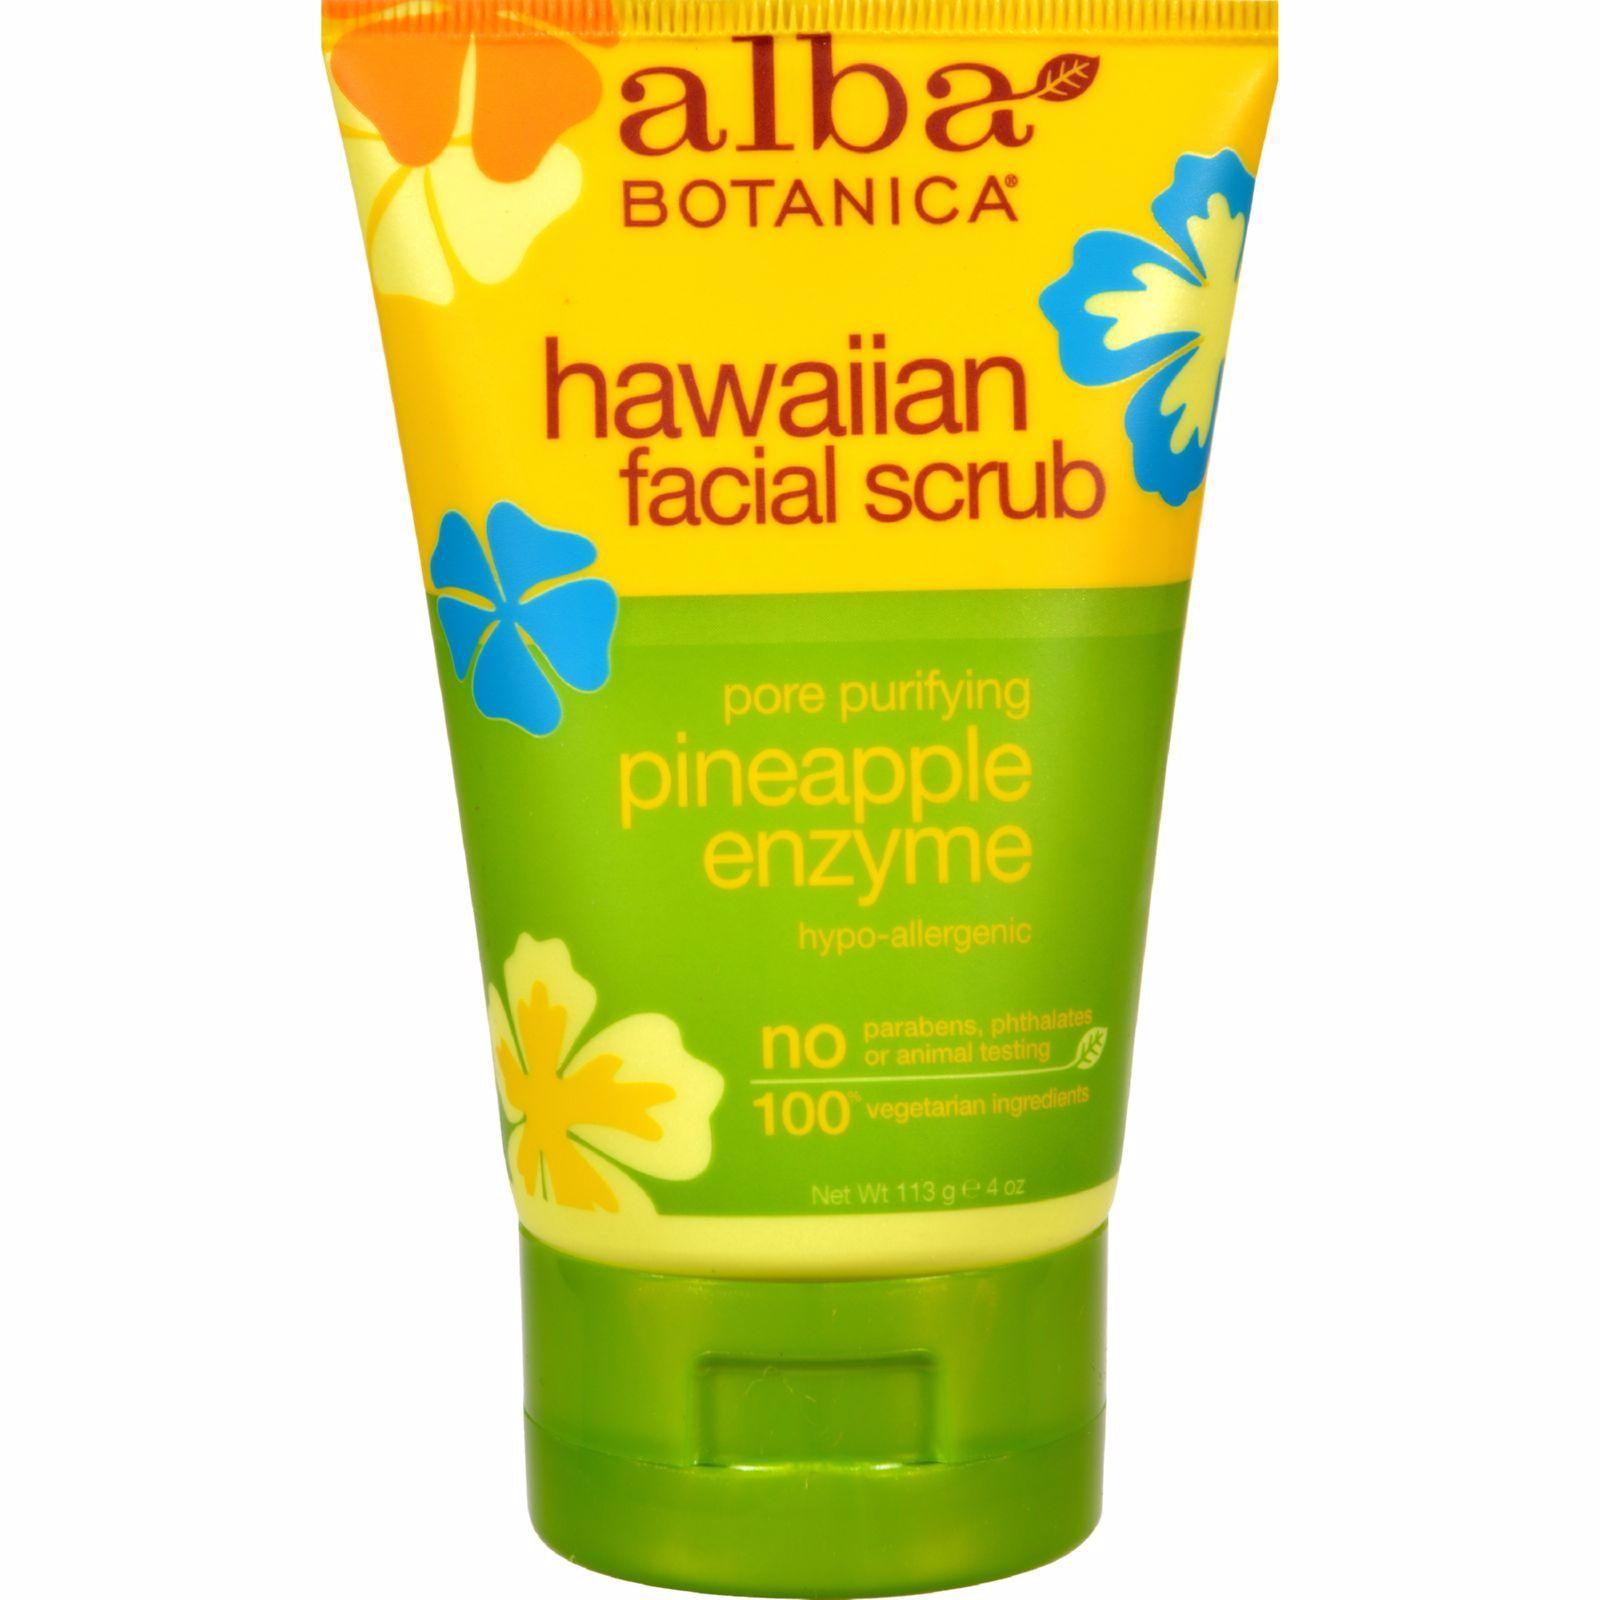 4 Pack - Alba Botanica Hawaiian Facial Scrub, Pore Purifying Pineapple Enzyme 4 oz Chapstick Cake Batter .15oz